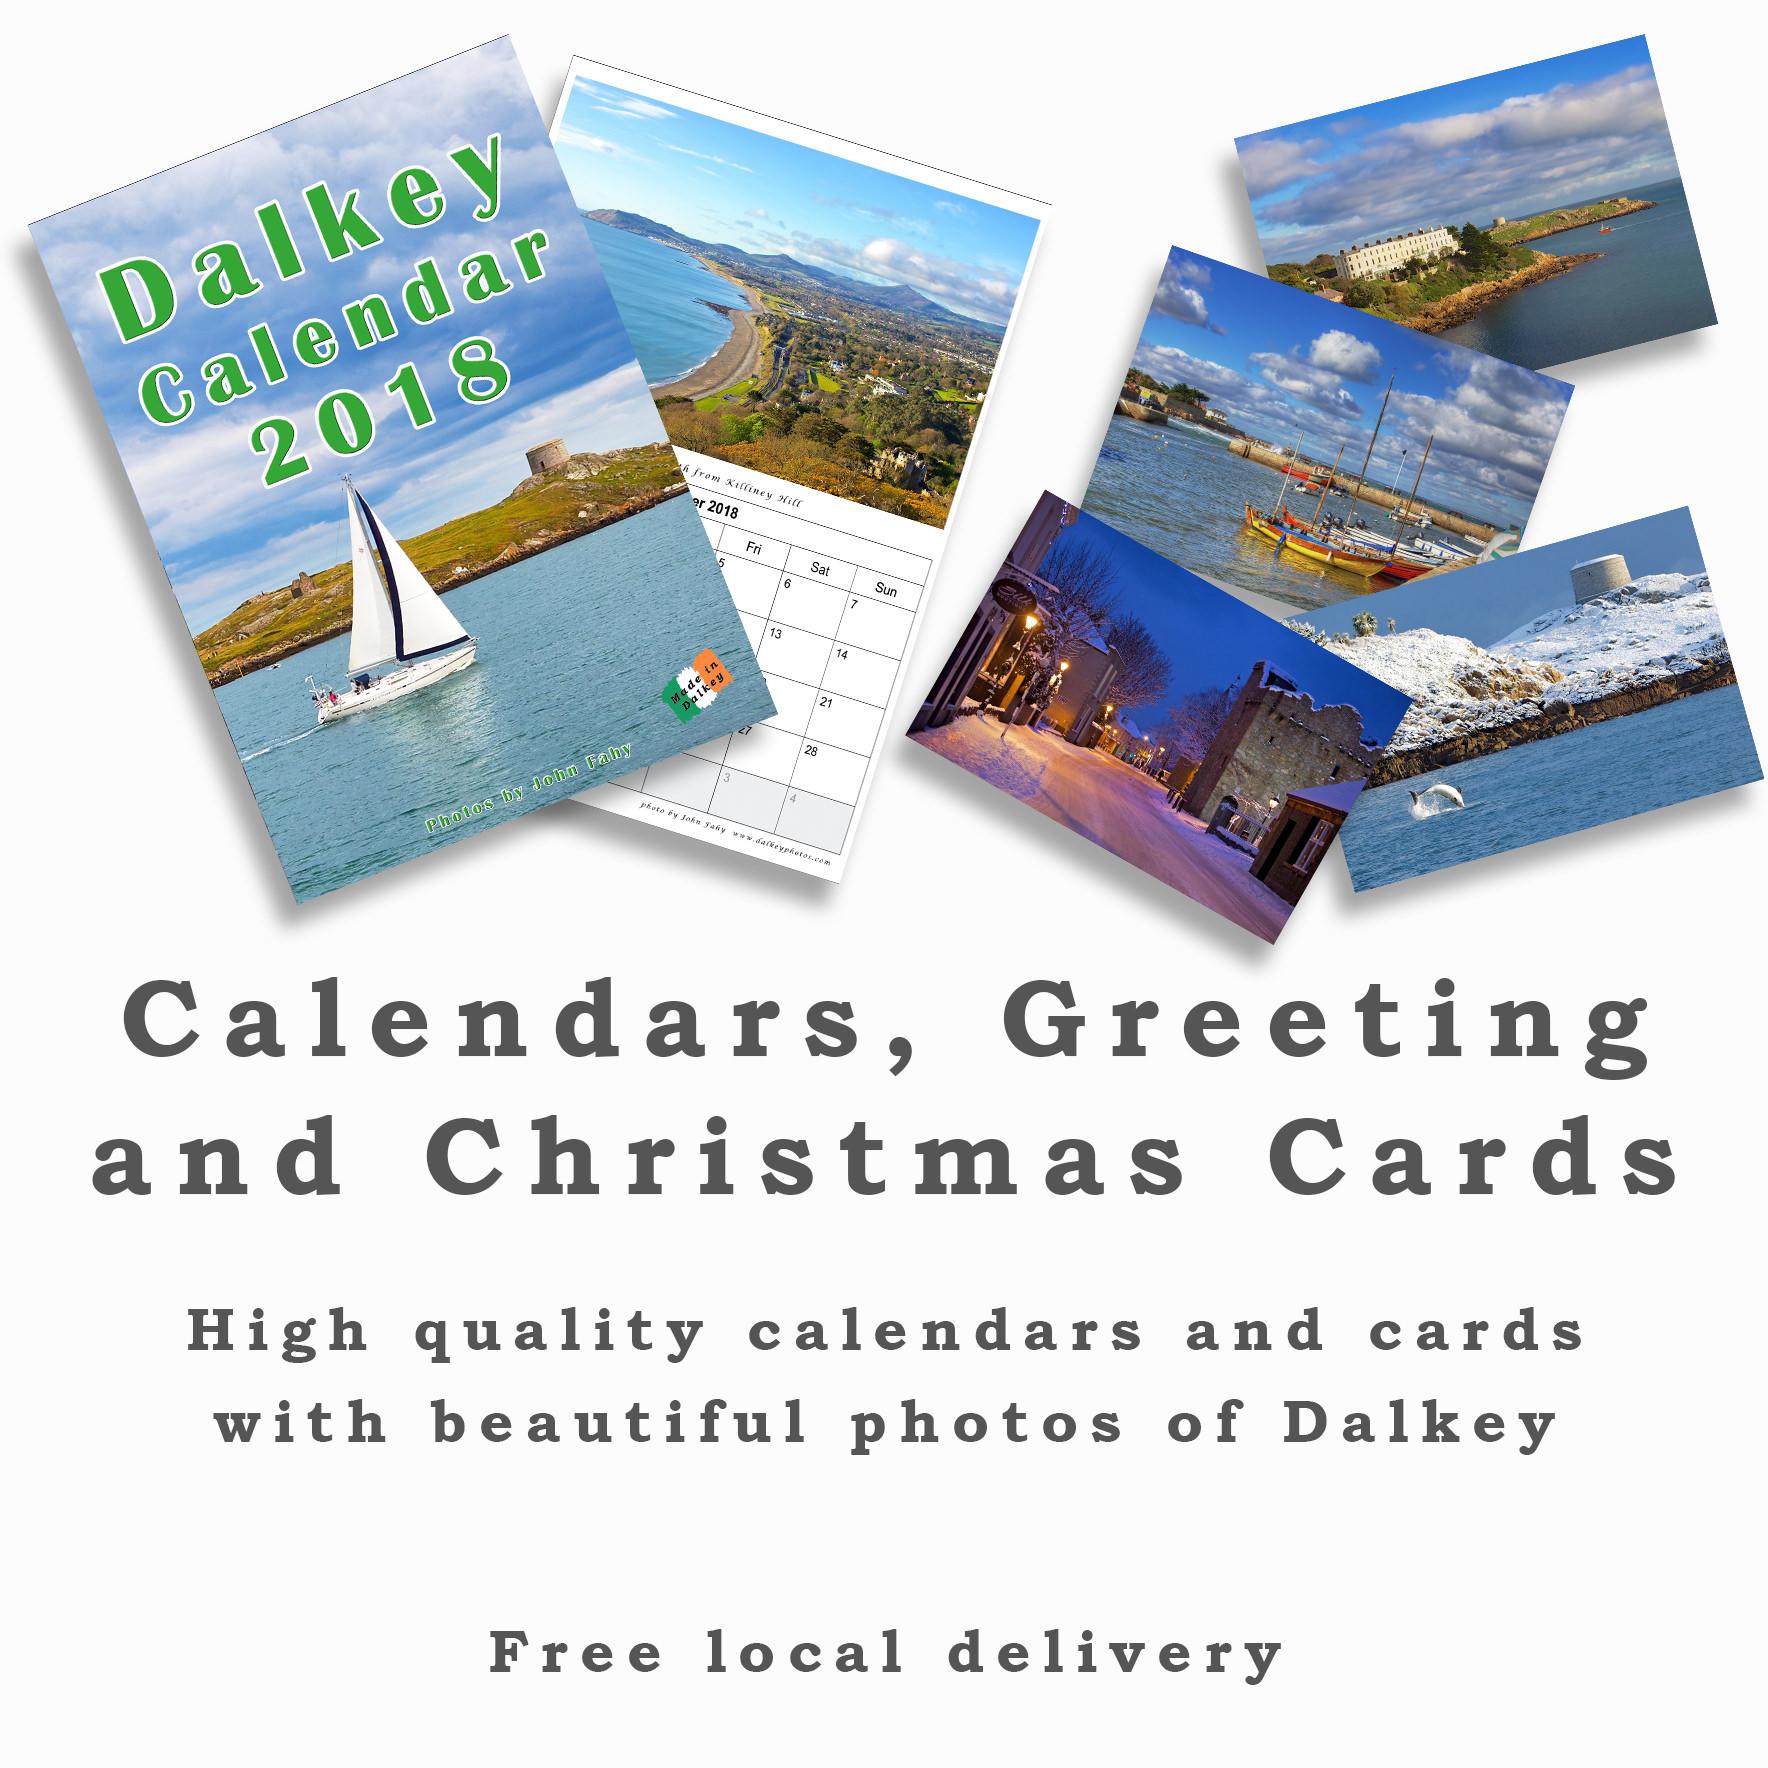 Dalkey Calendar